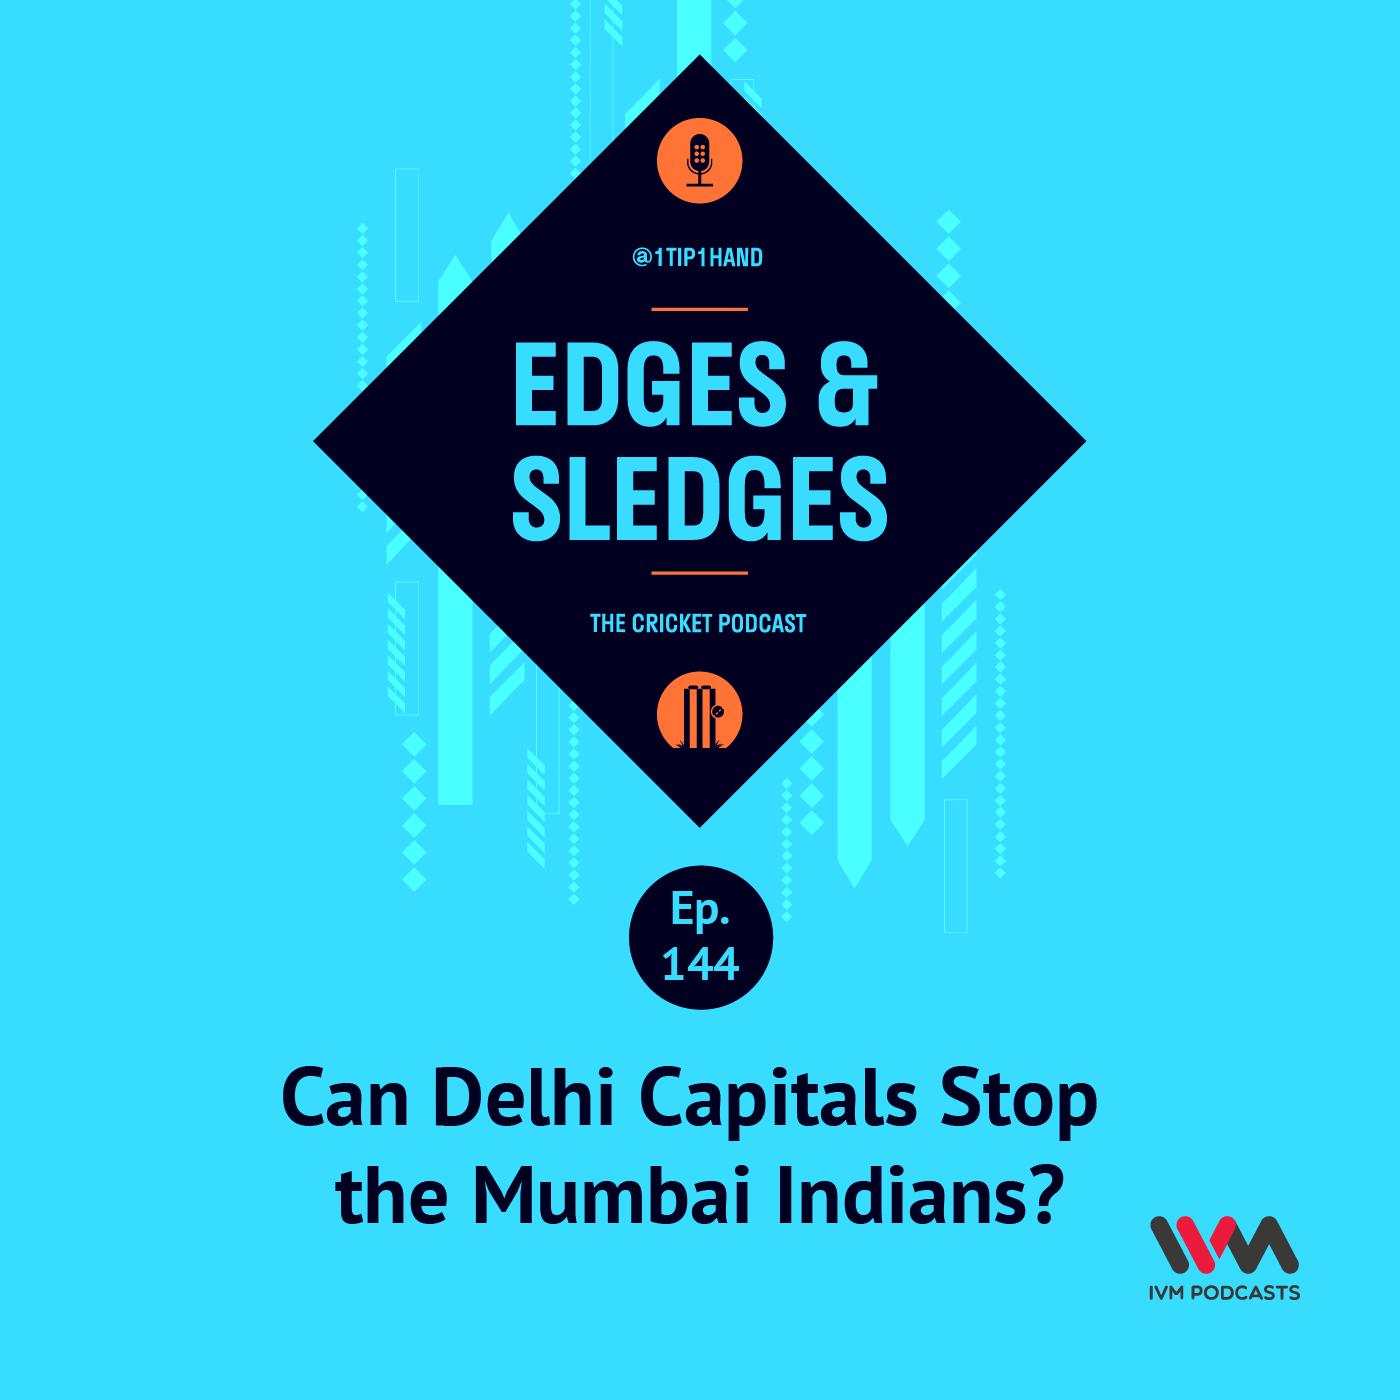 Ep. 144: Can Delhi Capitals Stop the Mumbai Indians?